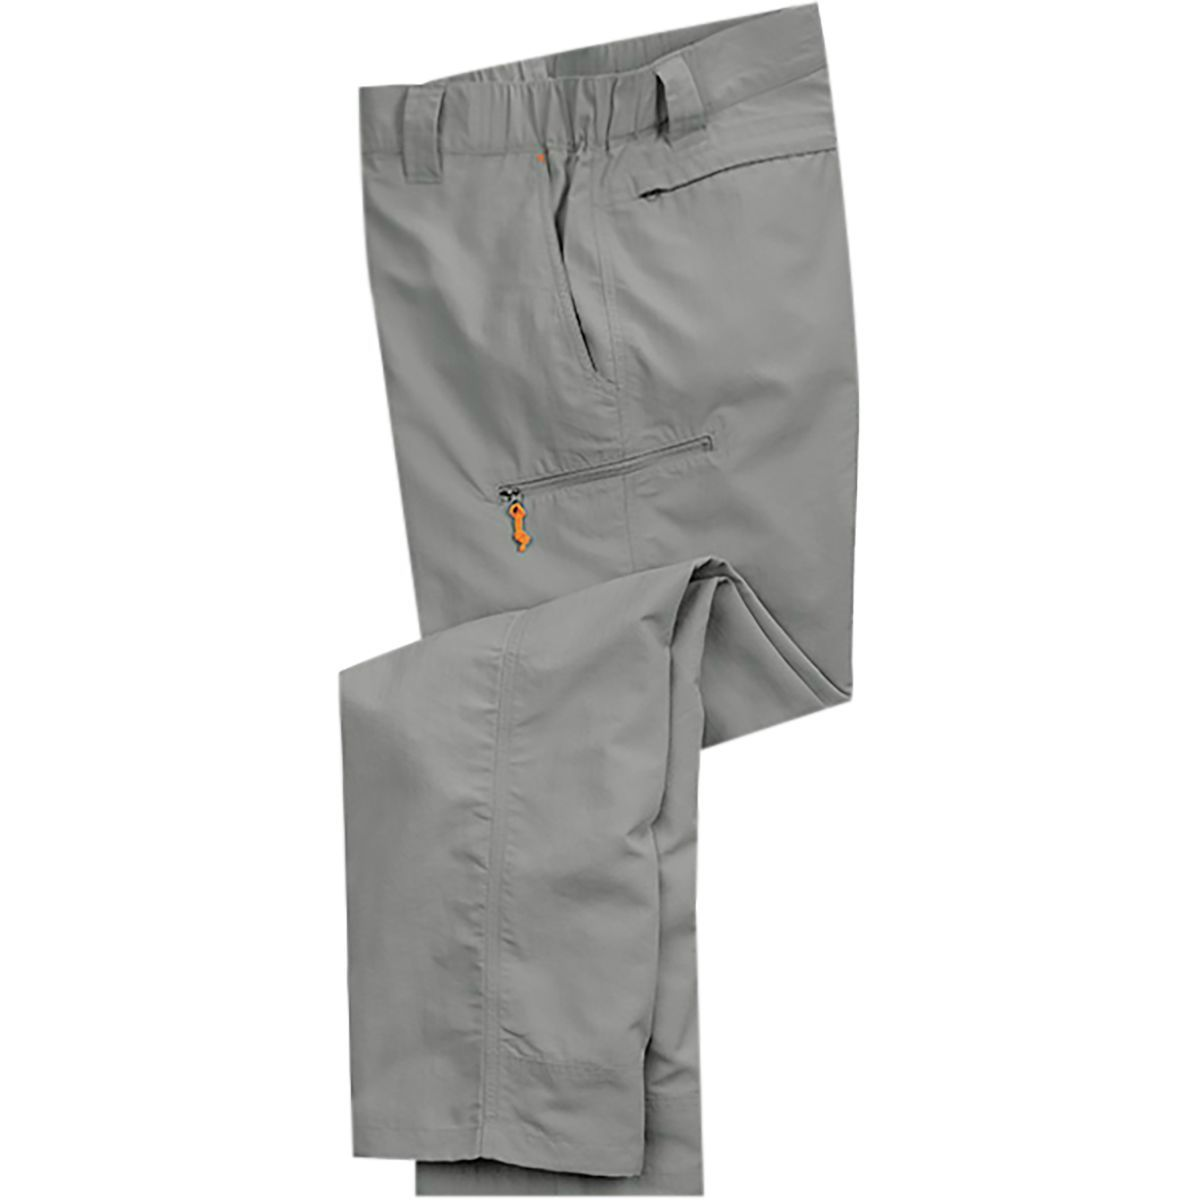 Orvis Jackson Quick-Dry Pant - Men's